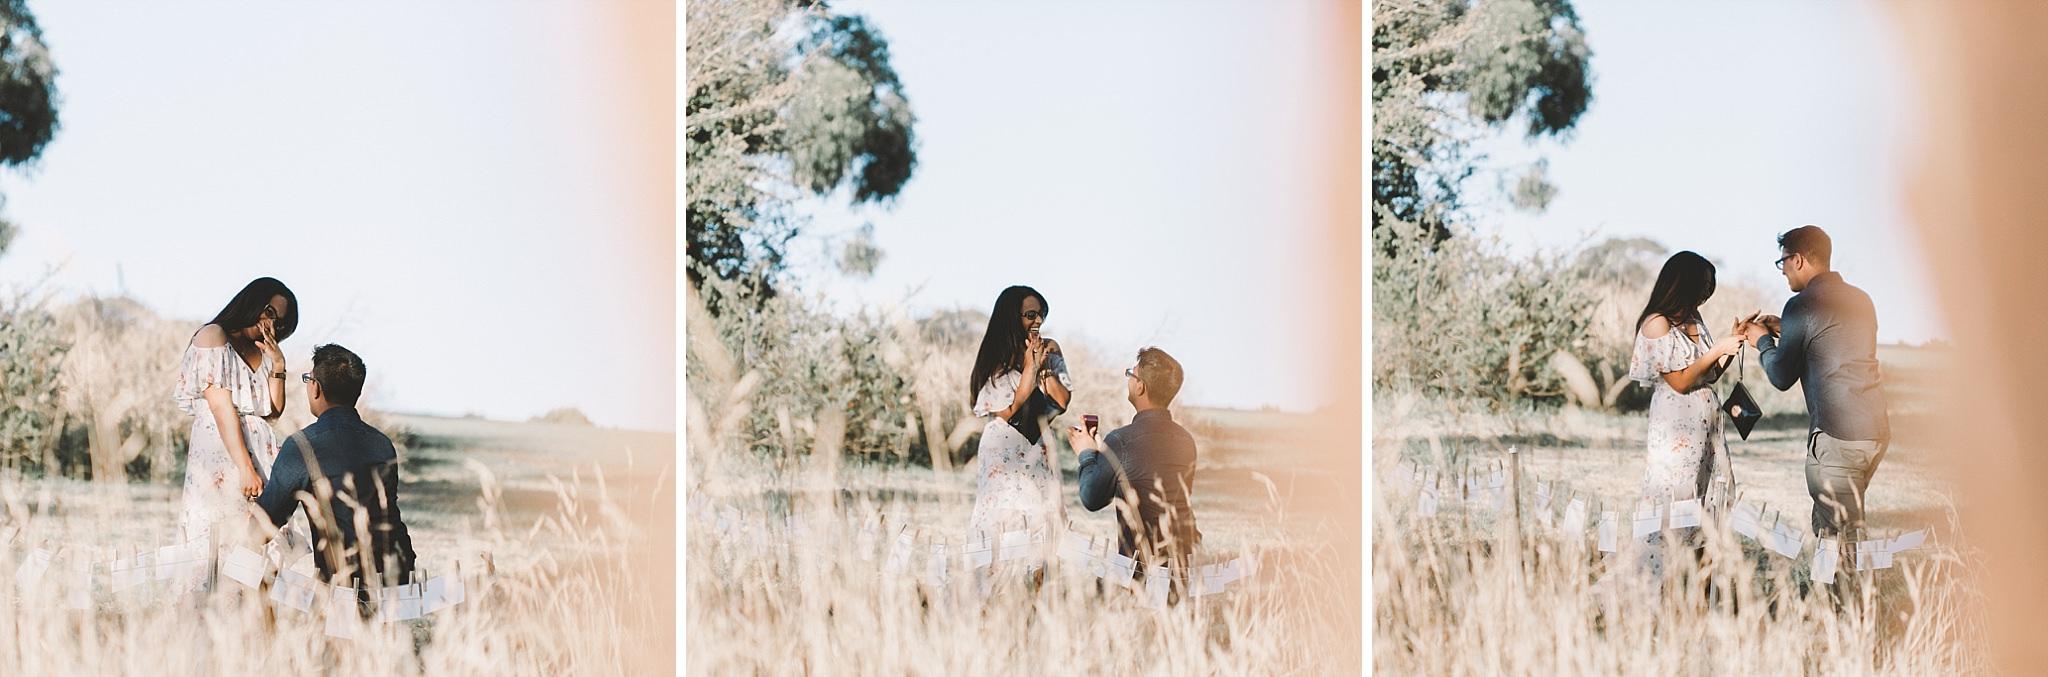 Dandenong Engagement Wedding Photographer-2.jpg